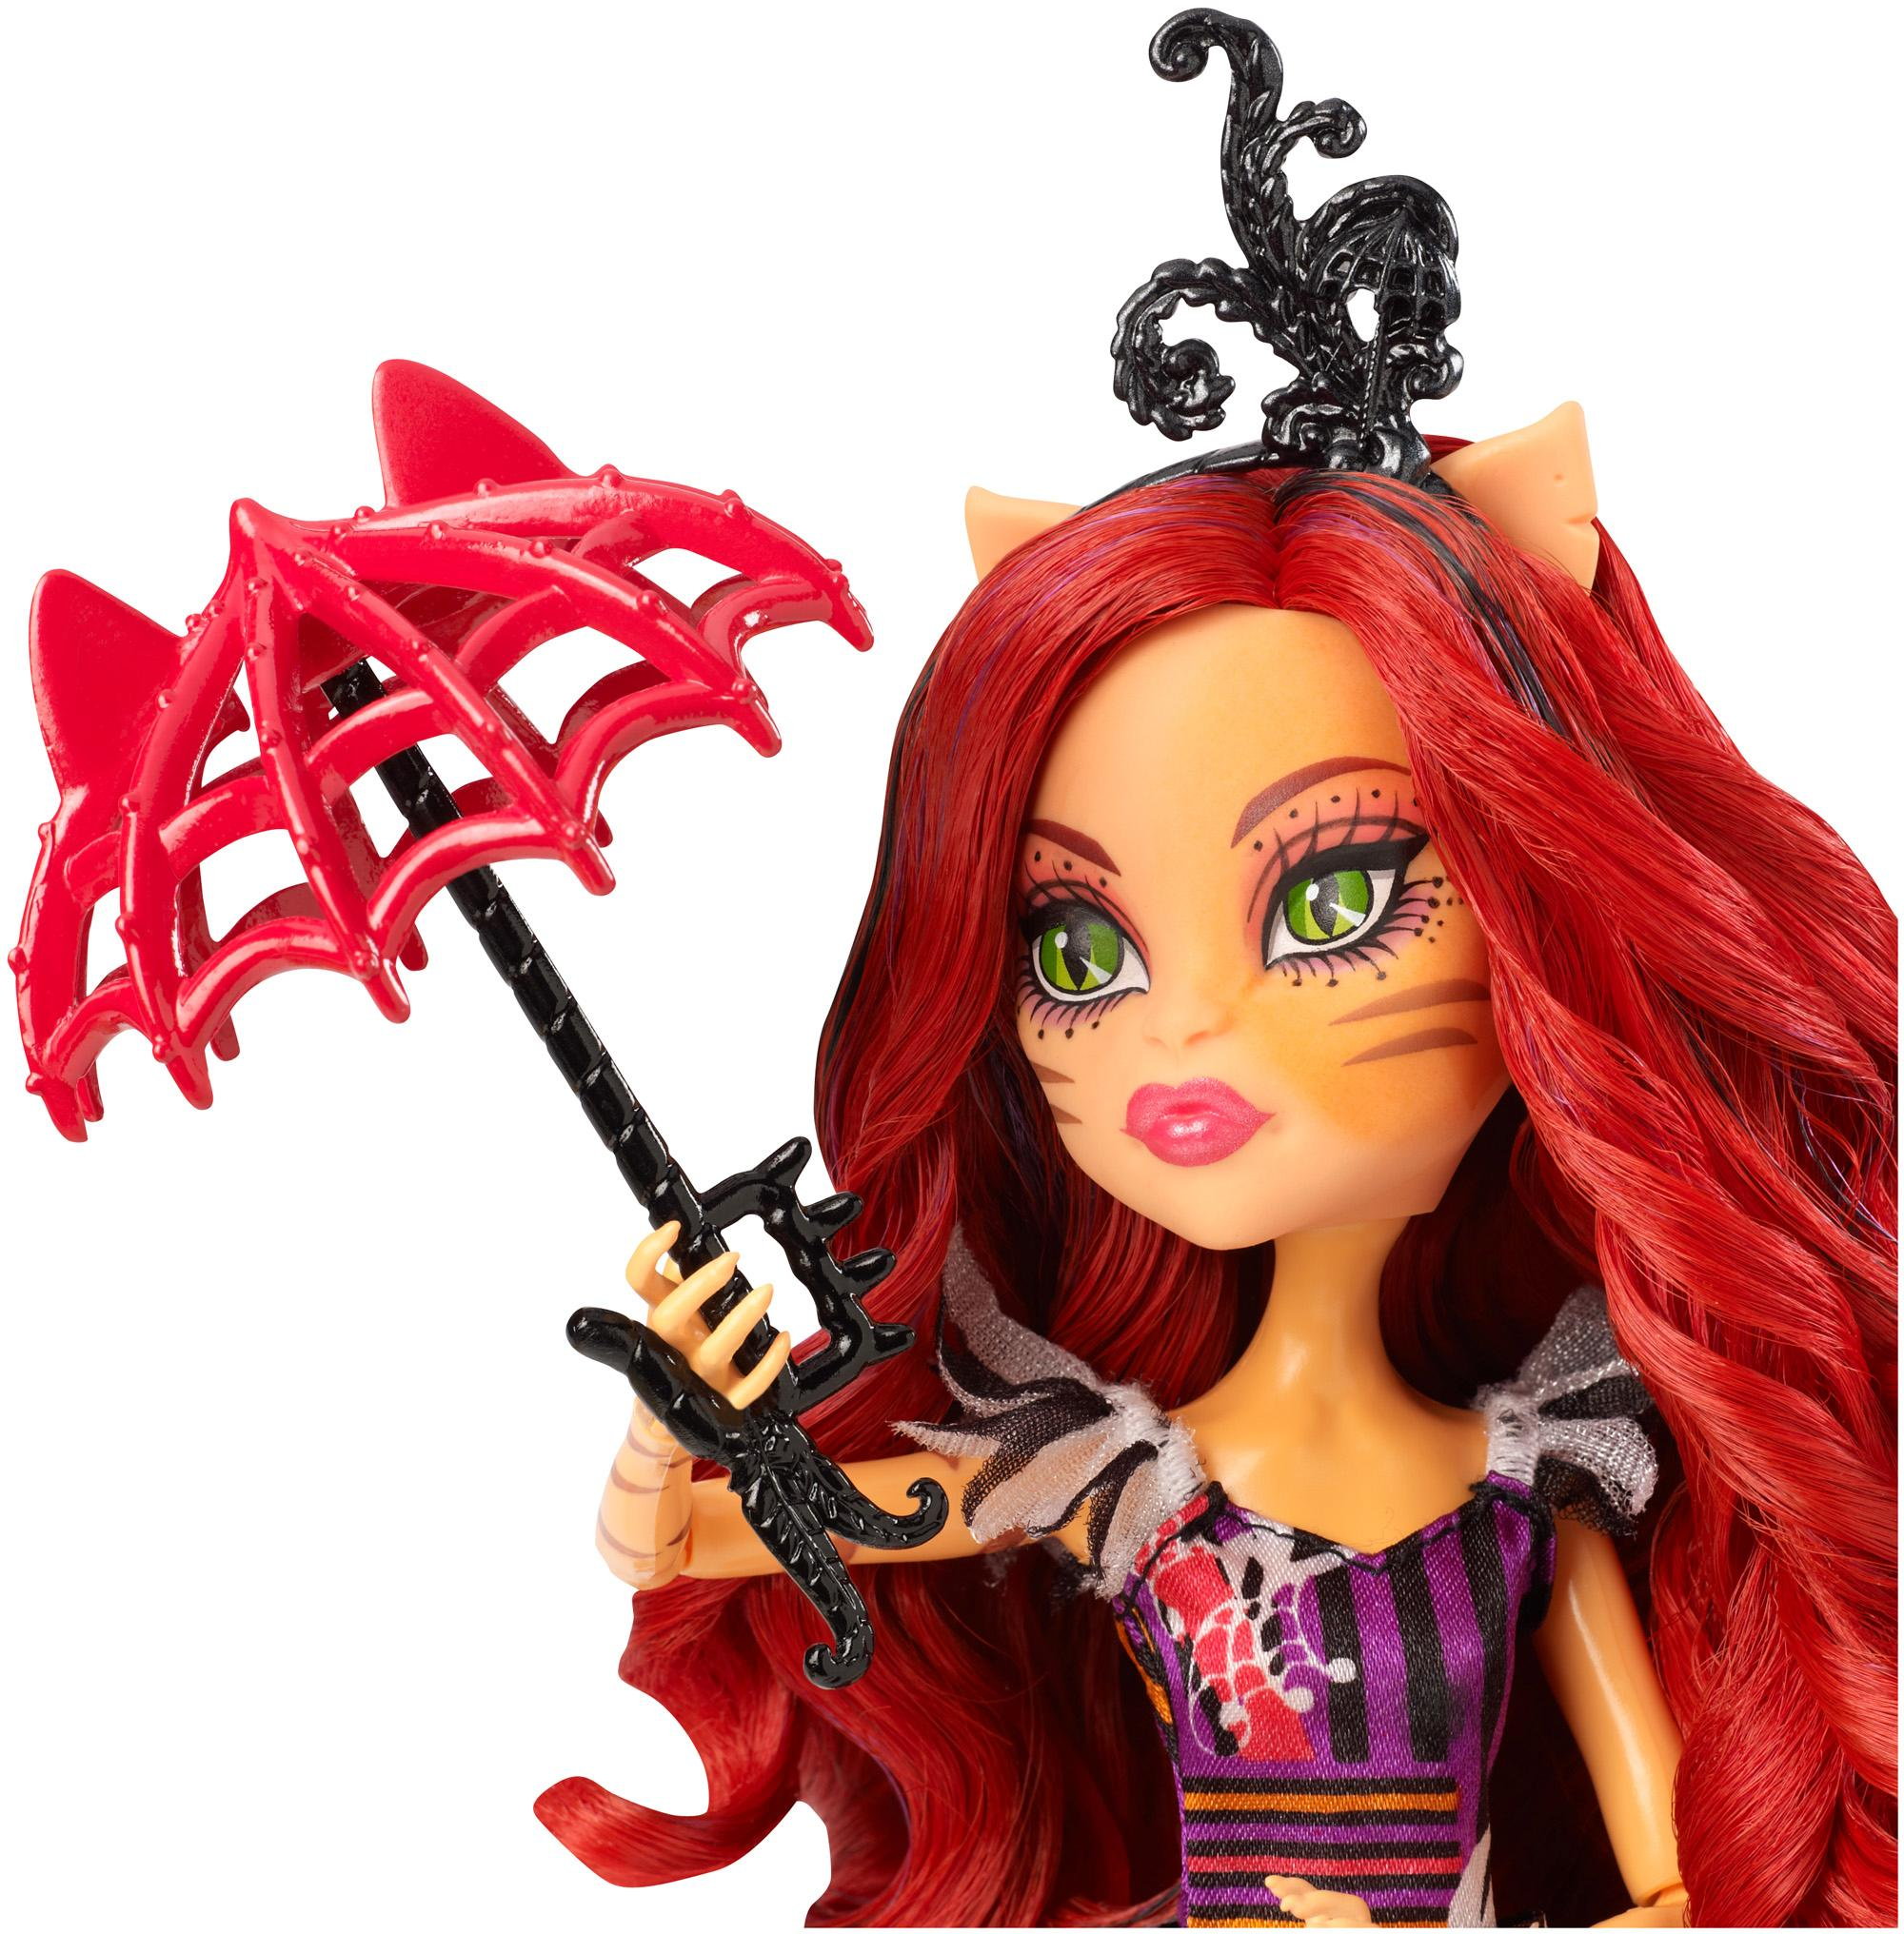 Amazon De: Amazon.com: Monster High Freak Du Chic Toralei Doll: Toys